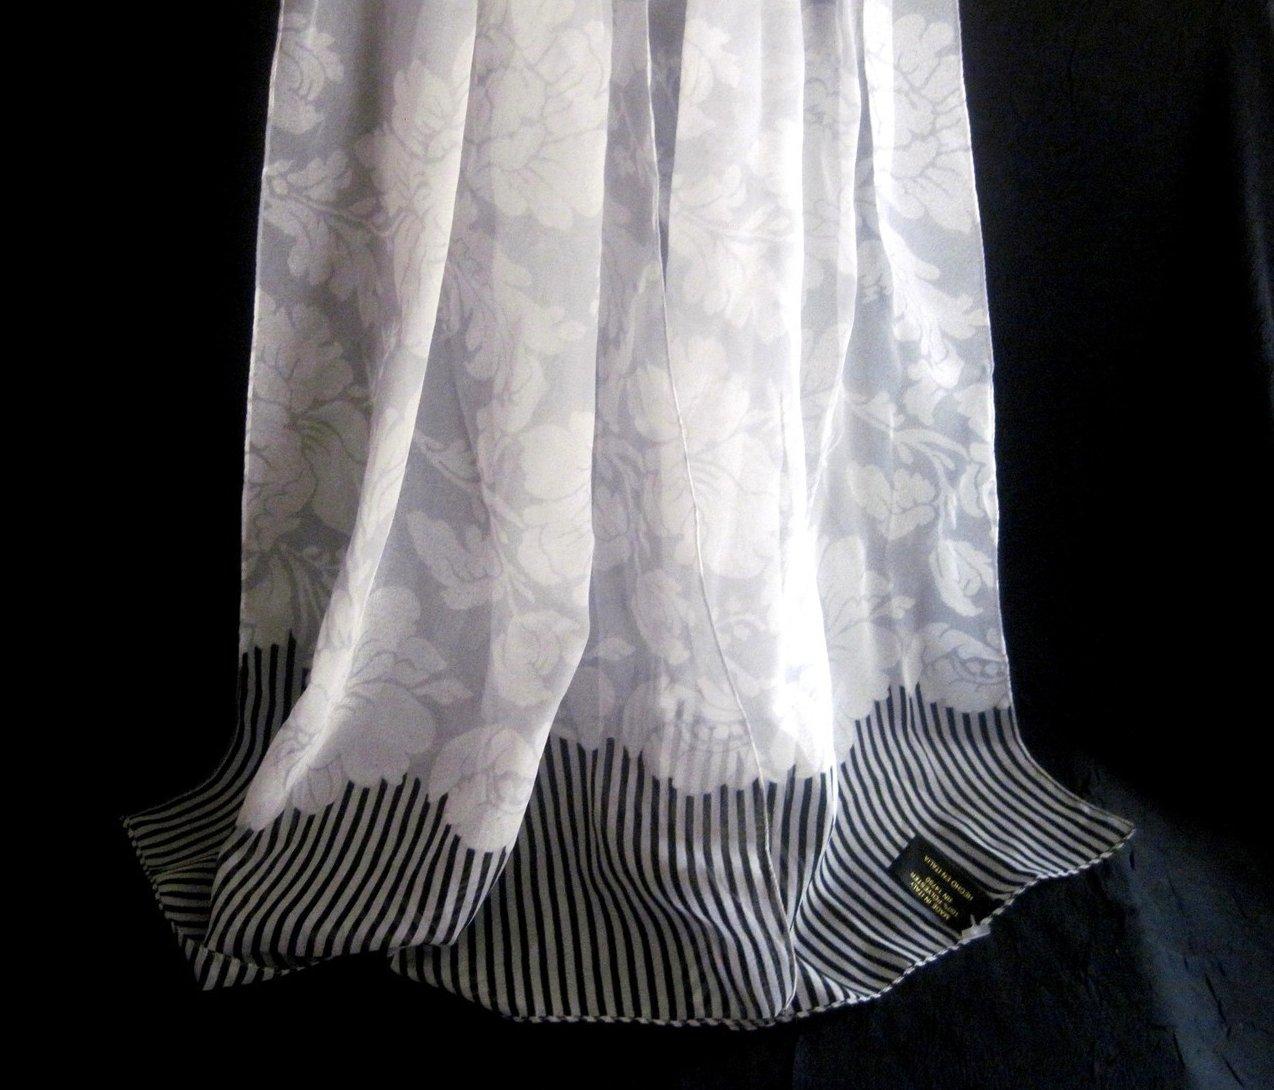 Image 1 of Peony Print Scarf White Gray Black 60 X 15 Semi Sheer